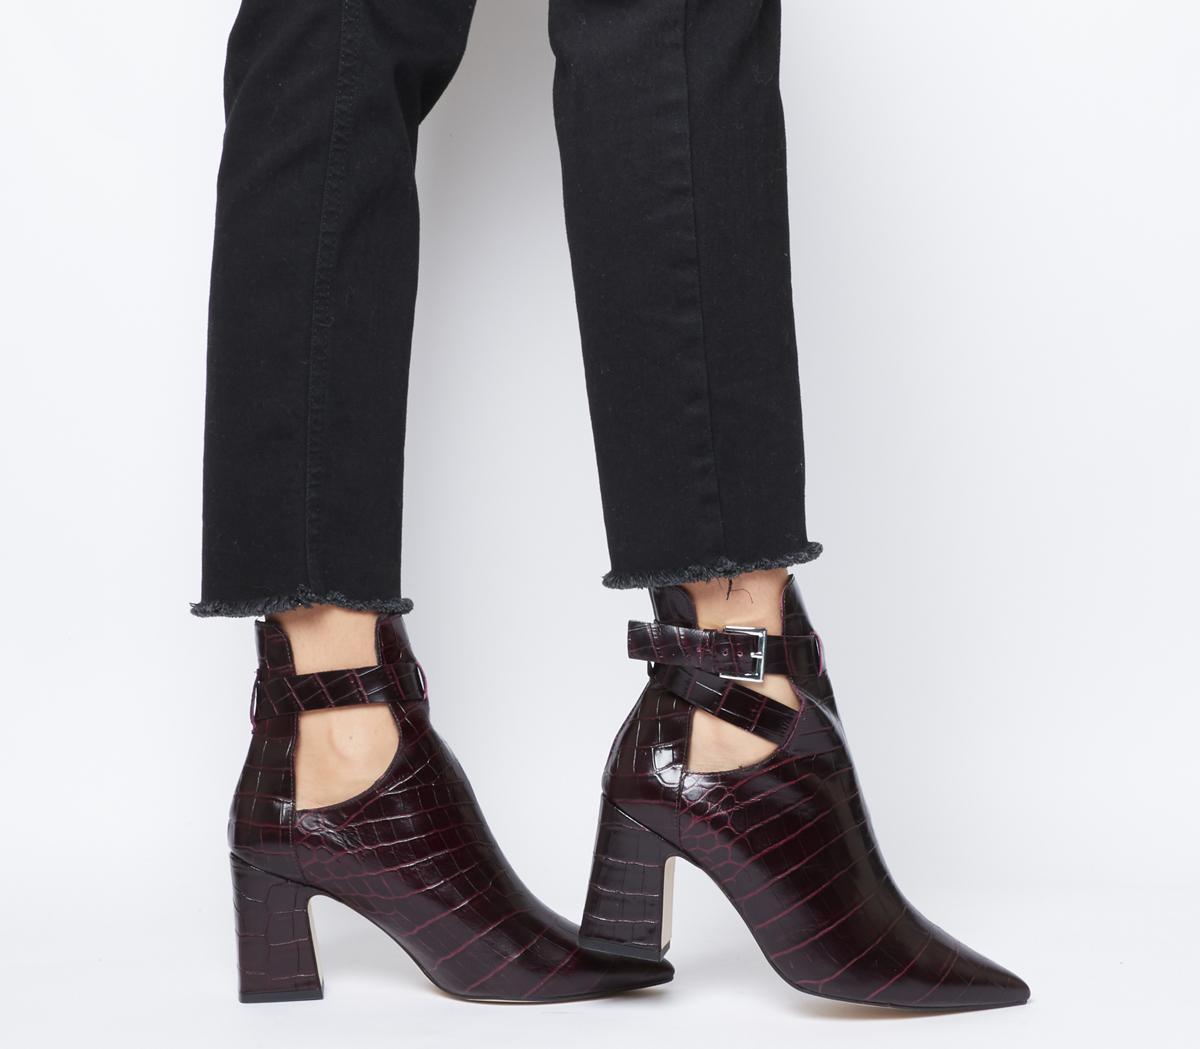 Office Alternative- Cut Out Block Heel